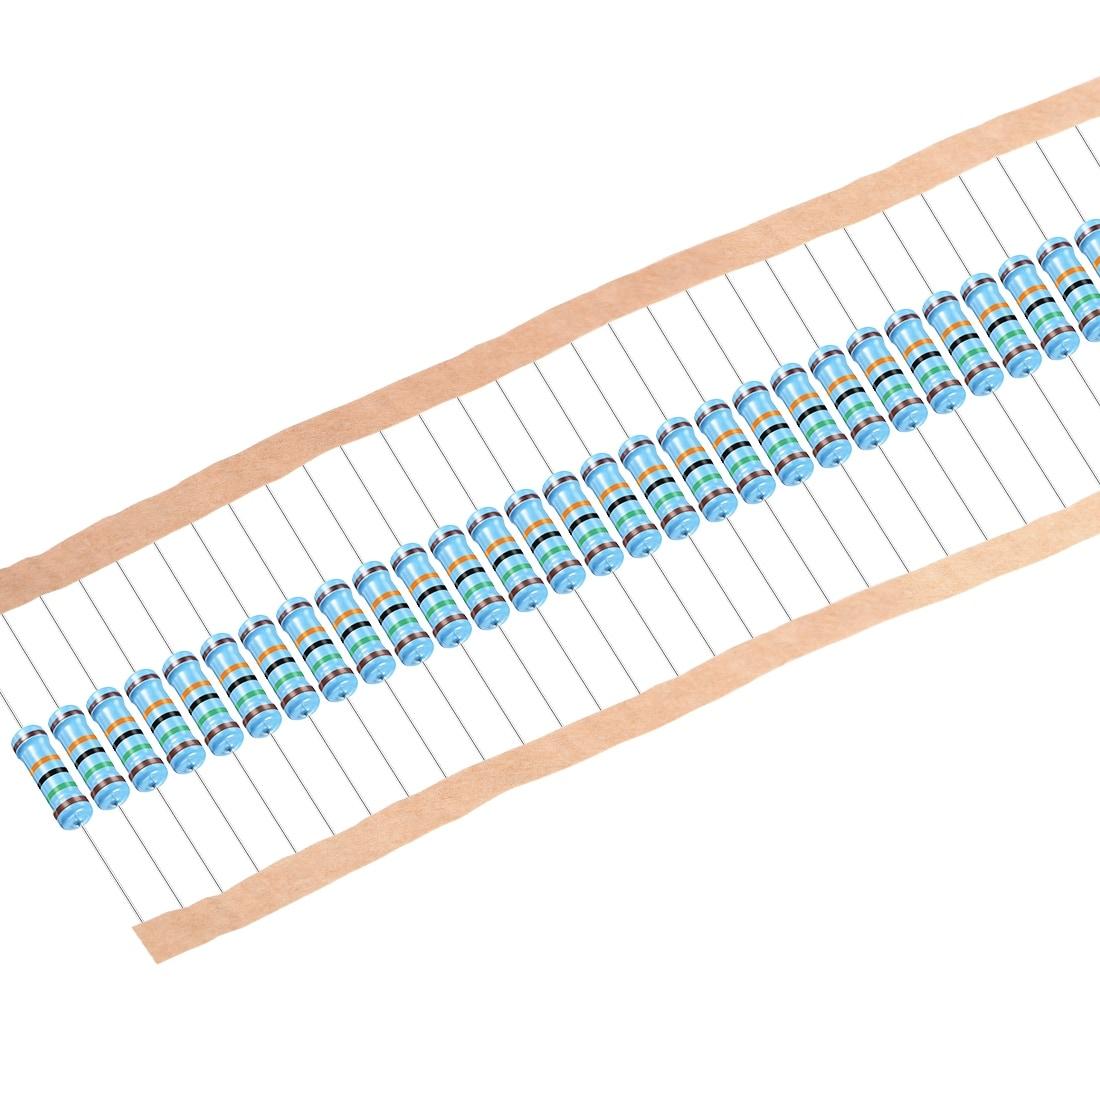 2W 2.7K Ohm 2 Watt 1/% Tolerance Metal Film Resistor 10 Pieces